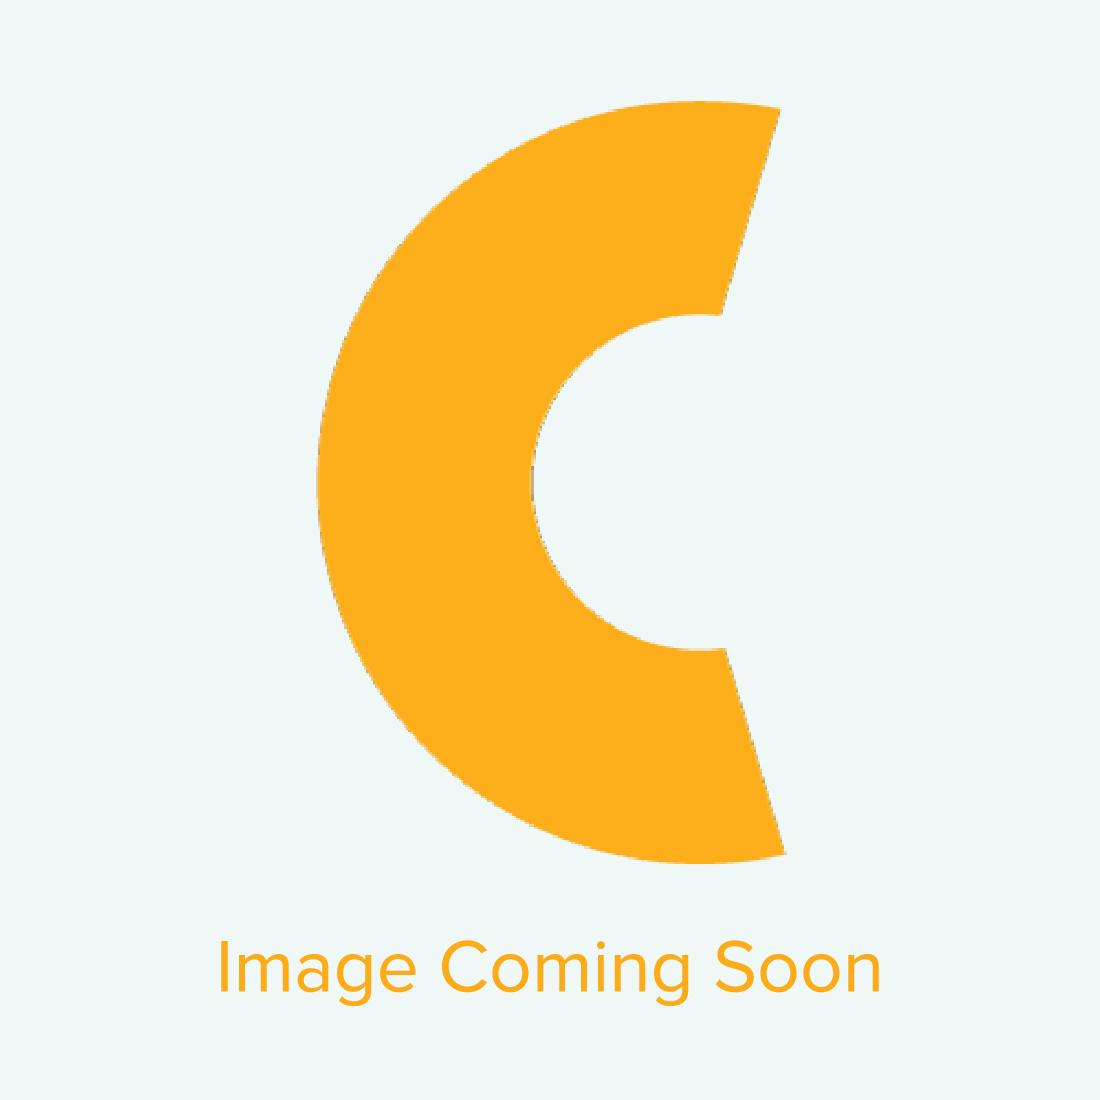 "Siser EasyPatterns Heat Transfer  - 12"" x 25yds - Ombre Curlz Coral"